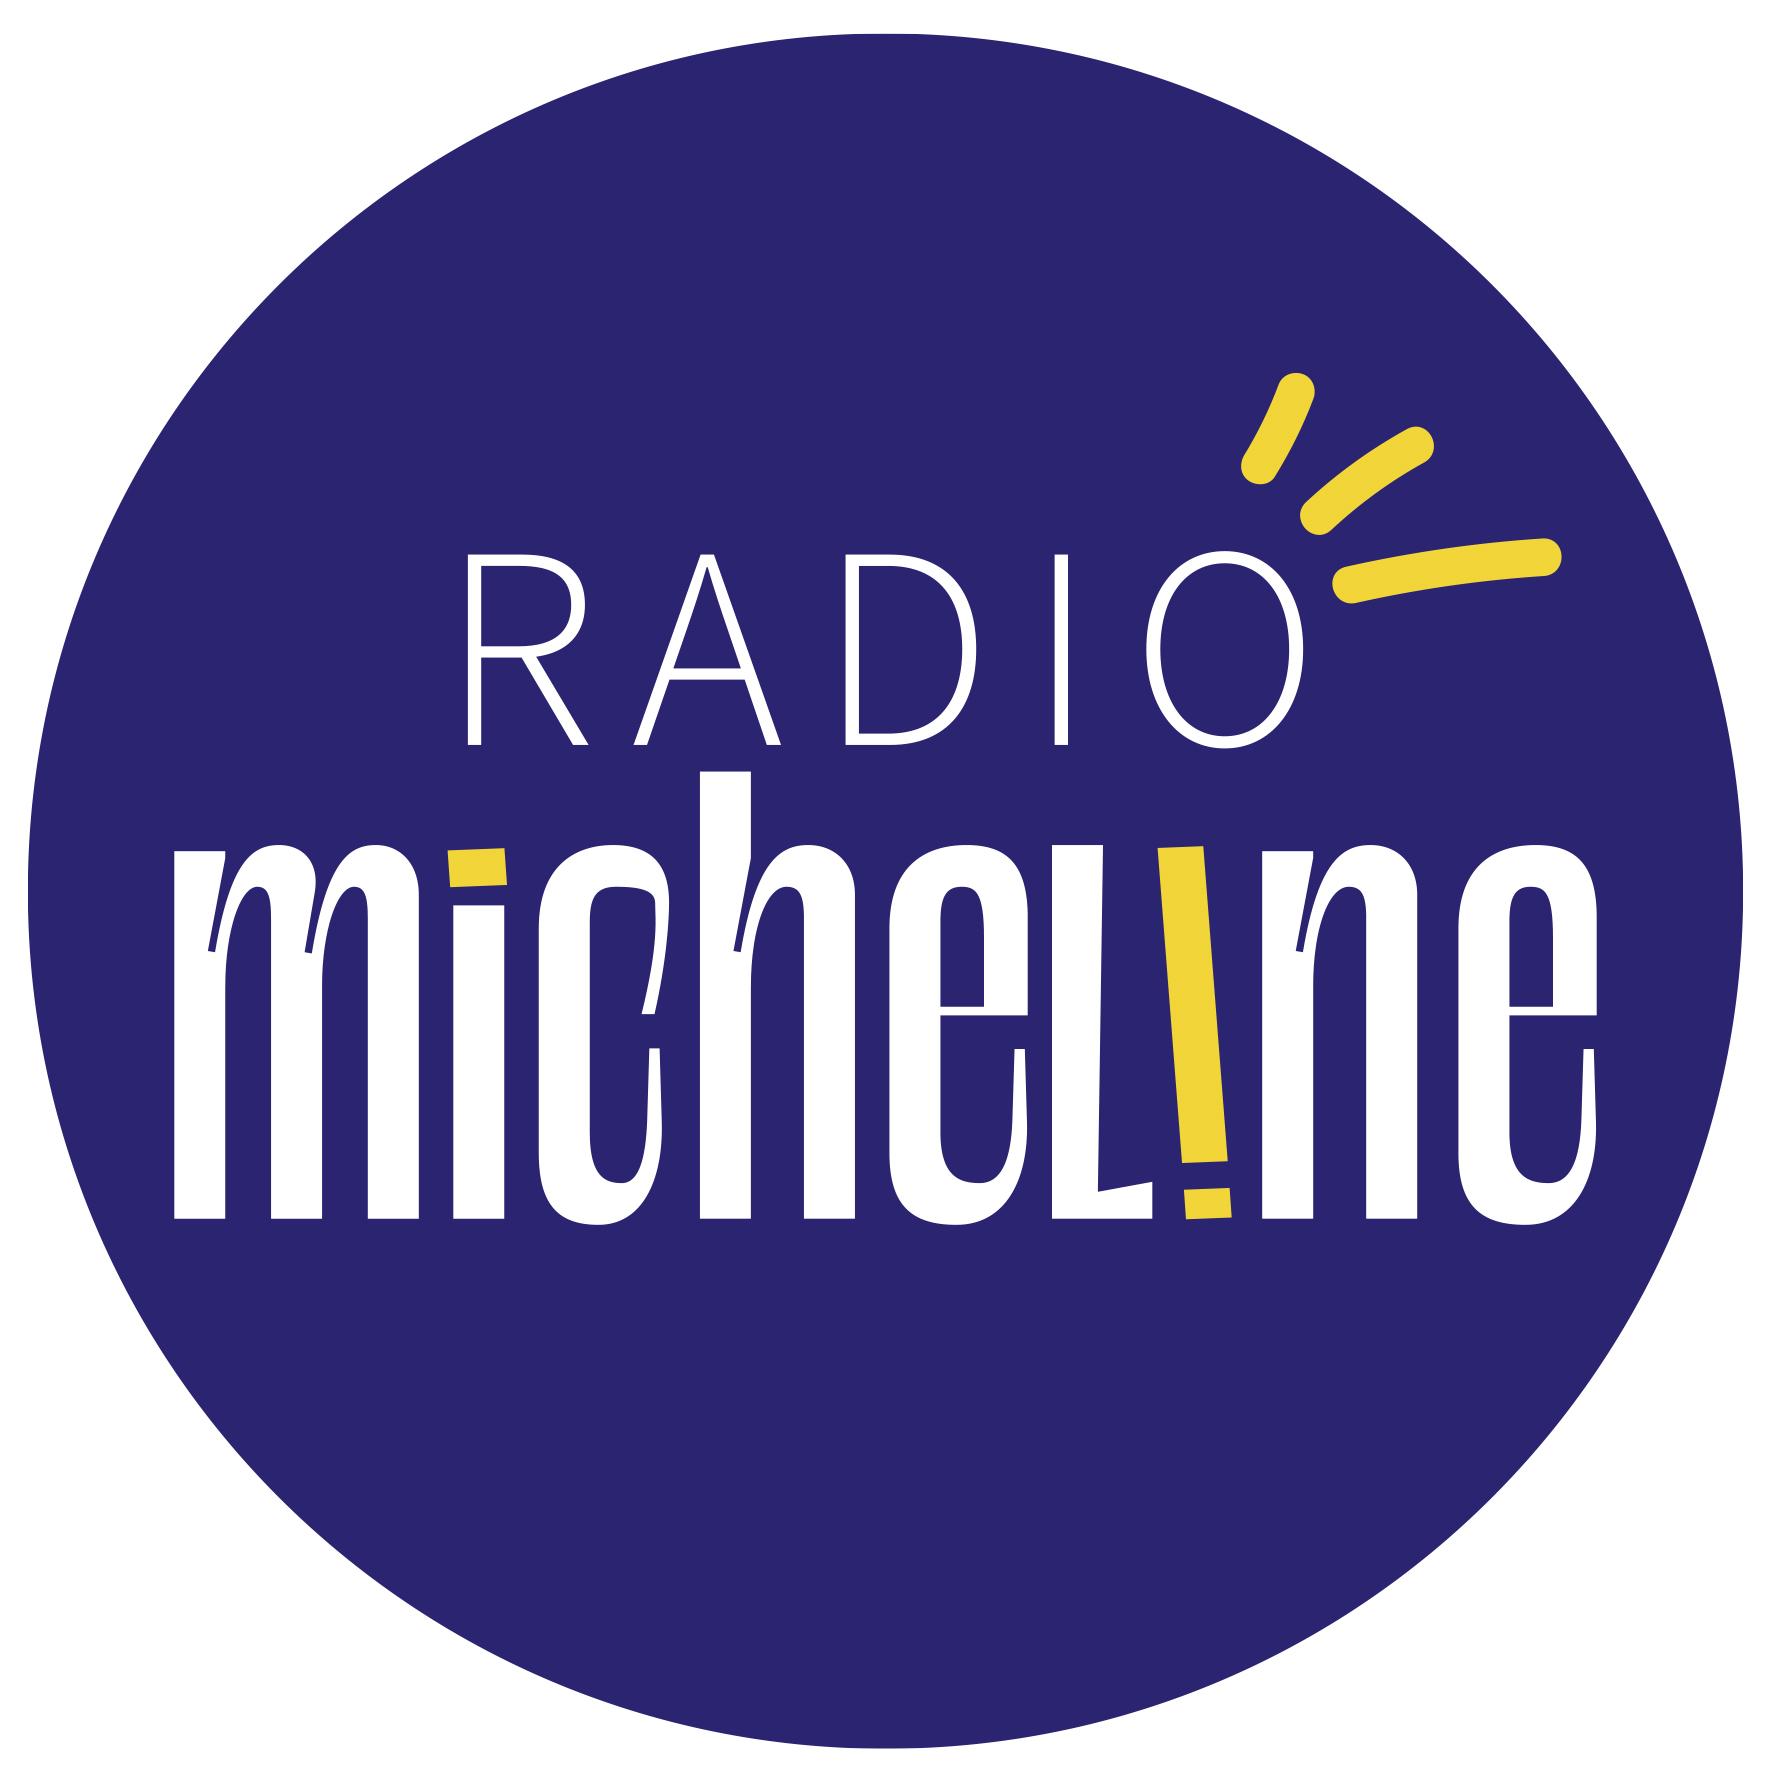 Pastille Micheline RS rond HD.jpg